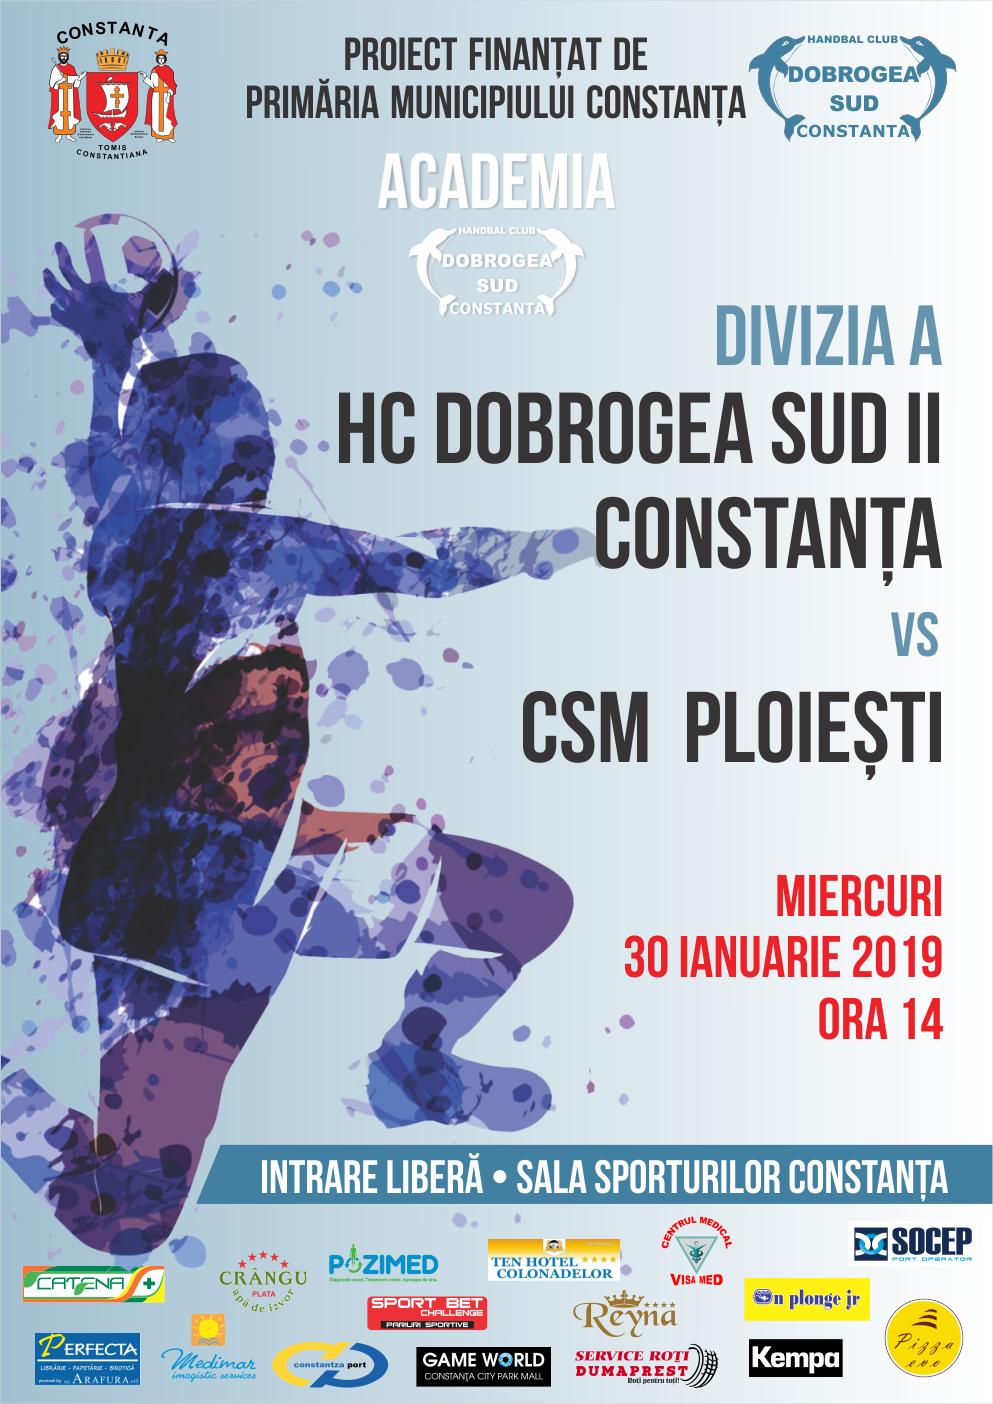 afis HC Dobrogea Sud Constanta vs CSM Ploiesti 30.01.2019